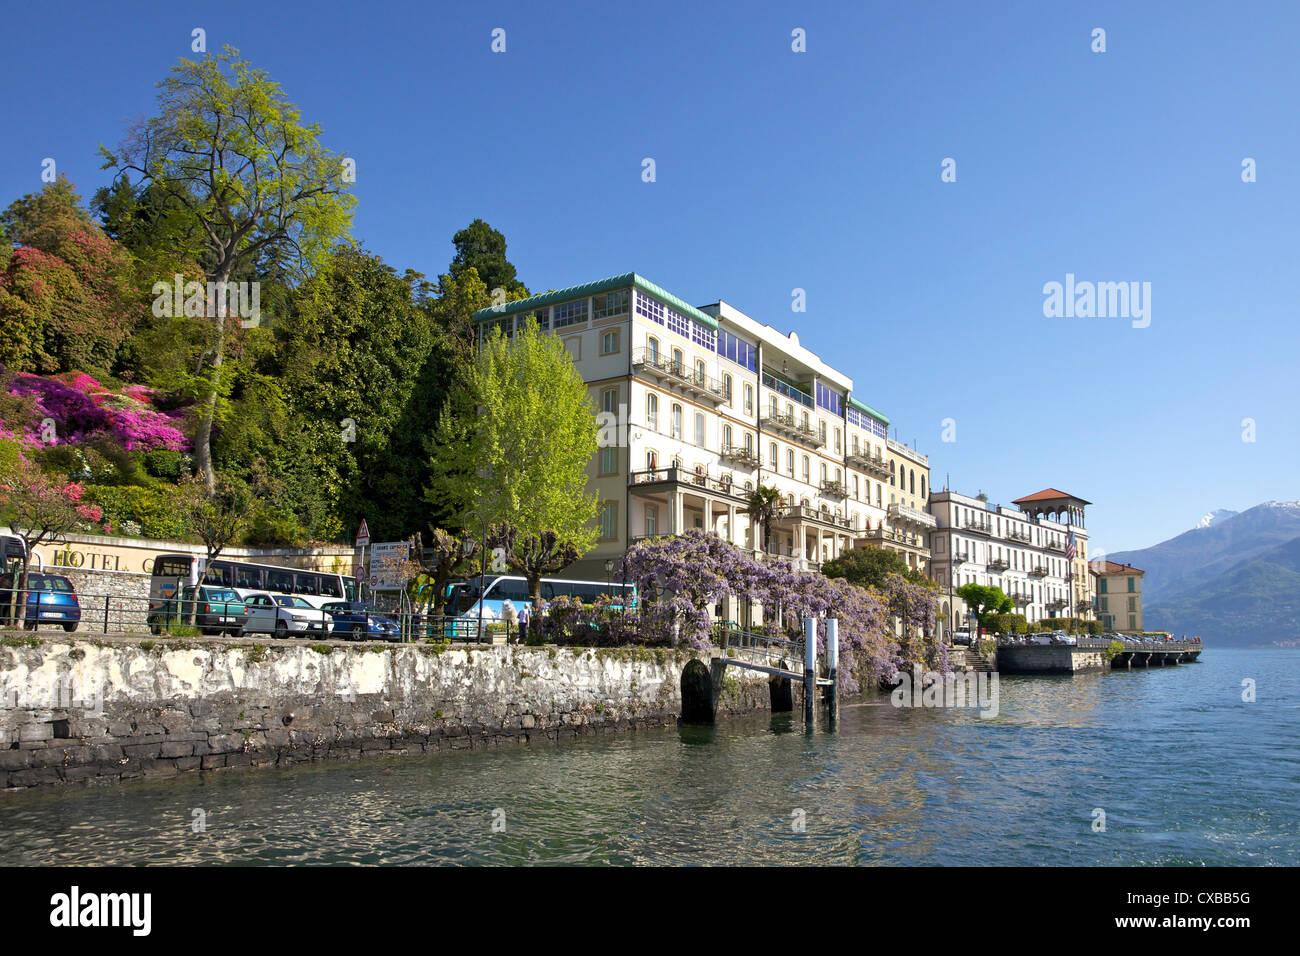 Fruhlingssonne Am Grand Hotel Cadenabbia Lombardei Comer See